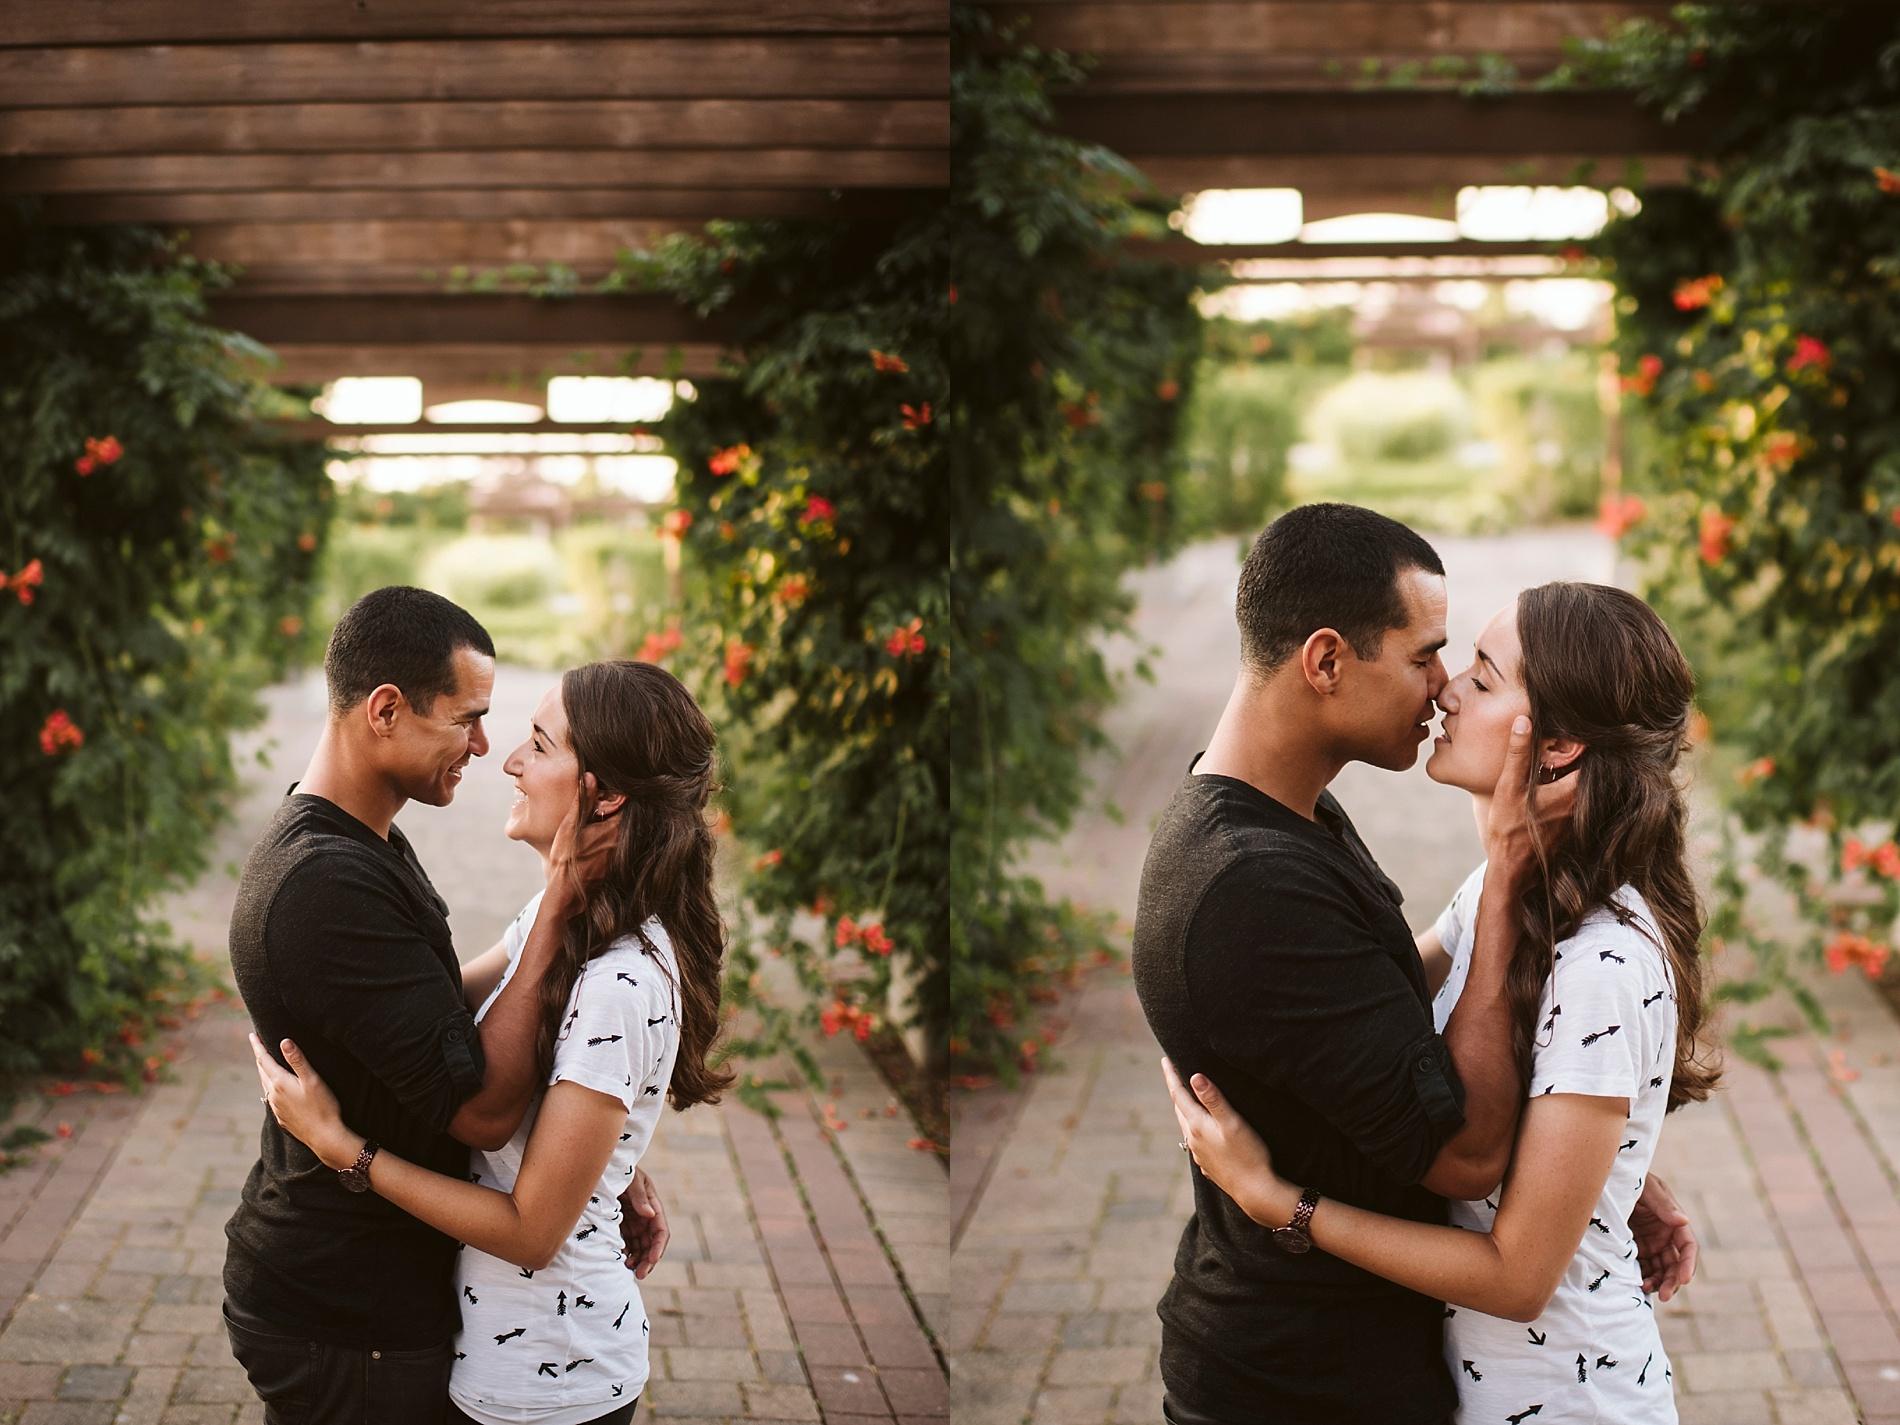 Richmond_Green_Engagement_shoot_Toronto_Wedding_Photographer11.jpg